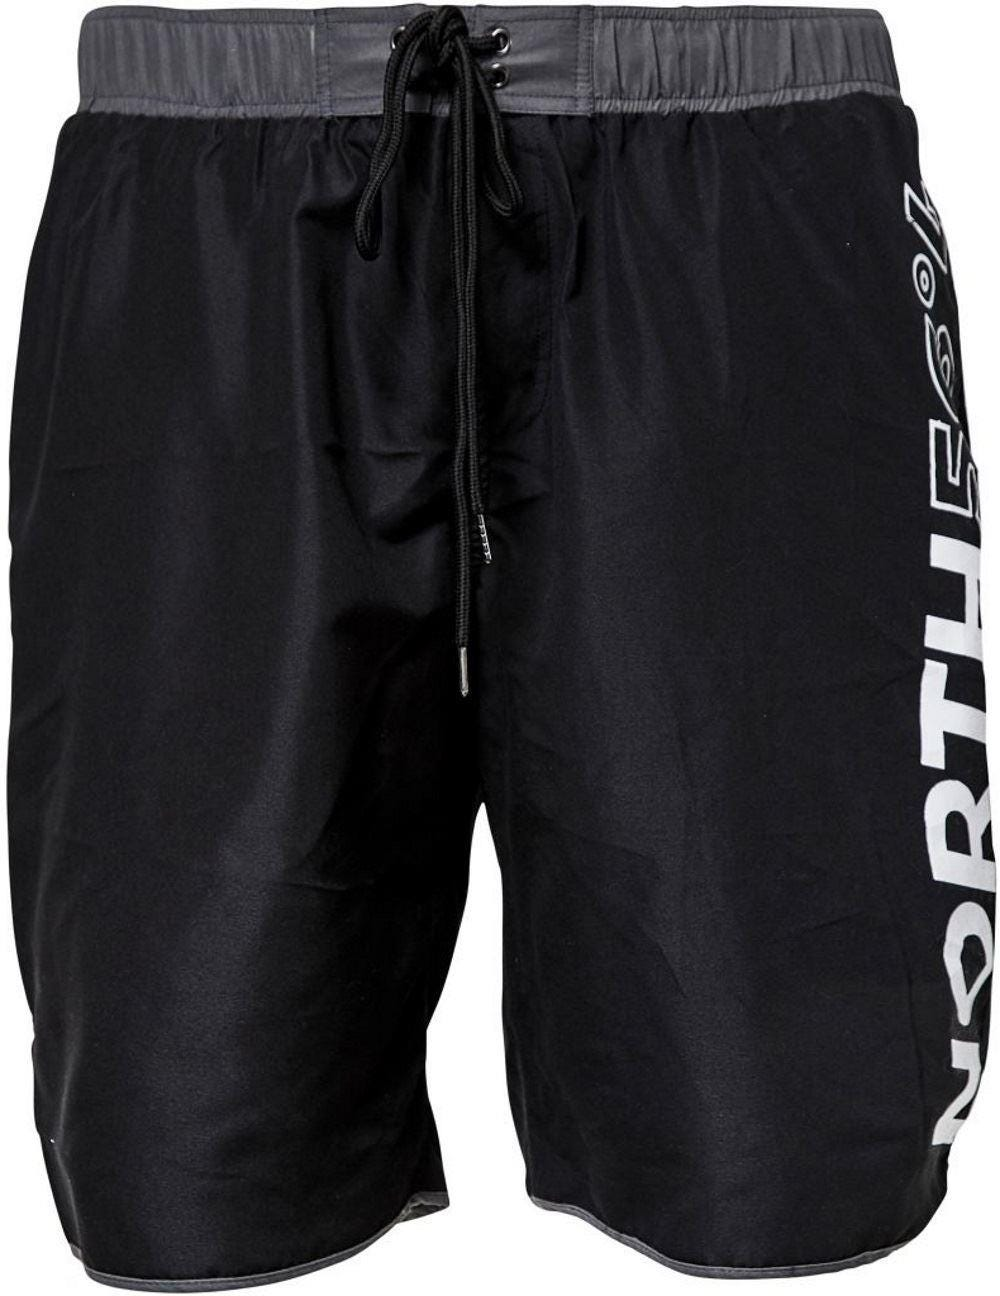 North564 Swim Shorts With Distinctive Logo - Black 3XL